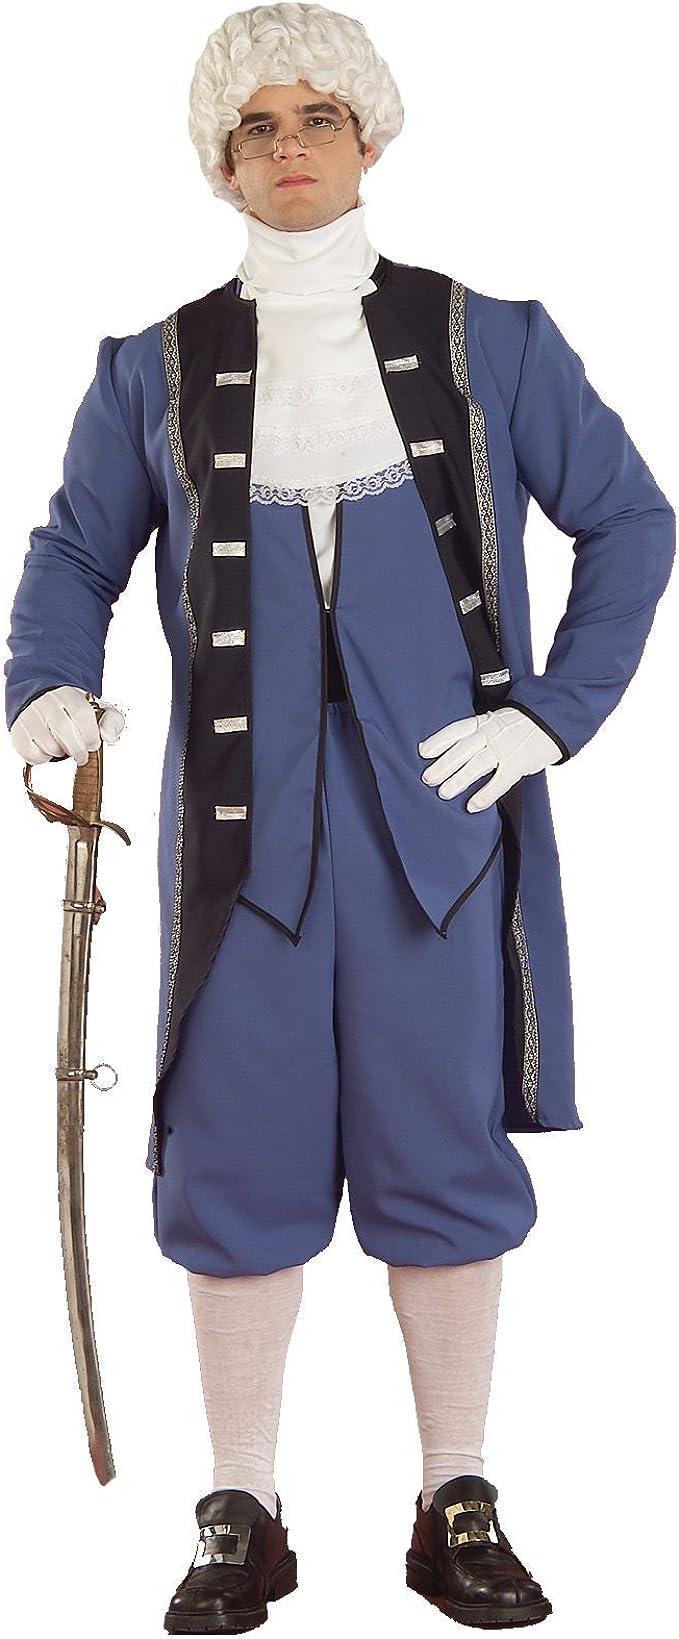 George Washington Revolutionary War Blue Adult Costume 3 Sizes